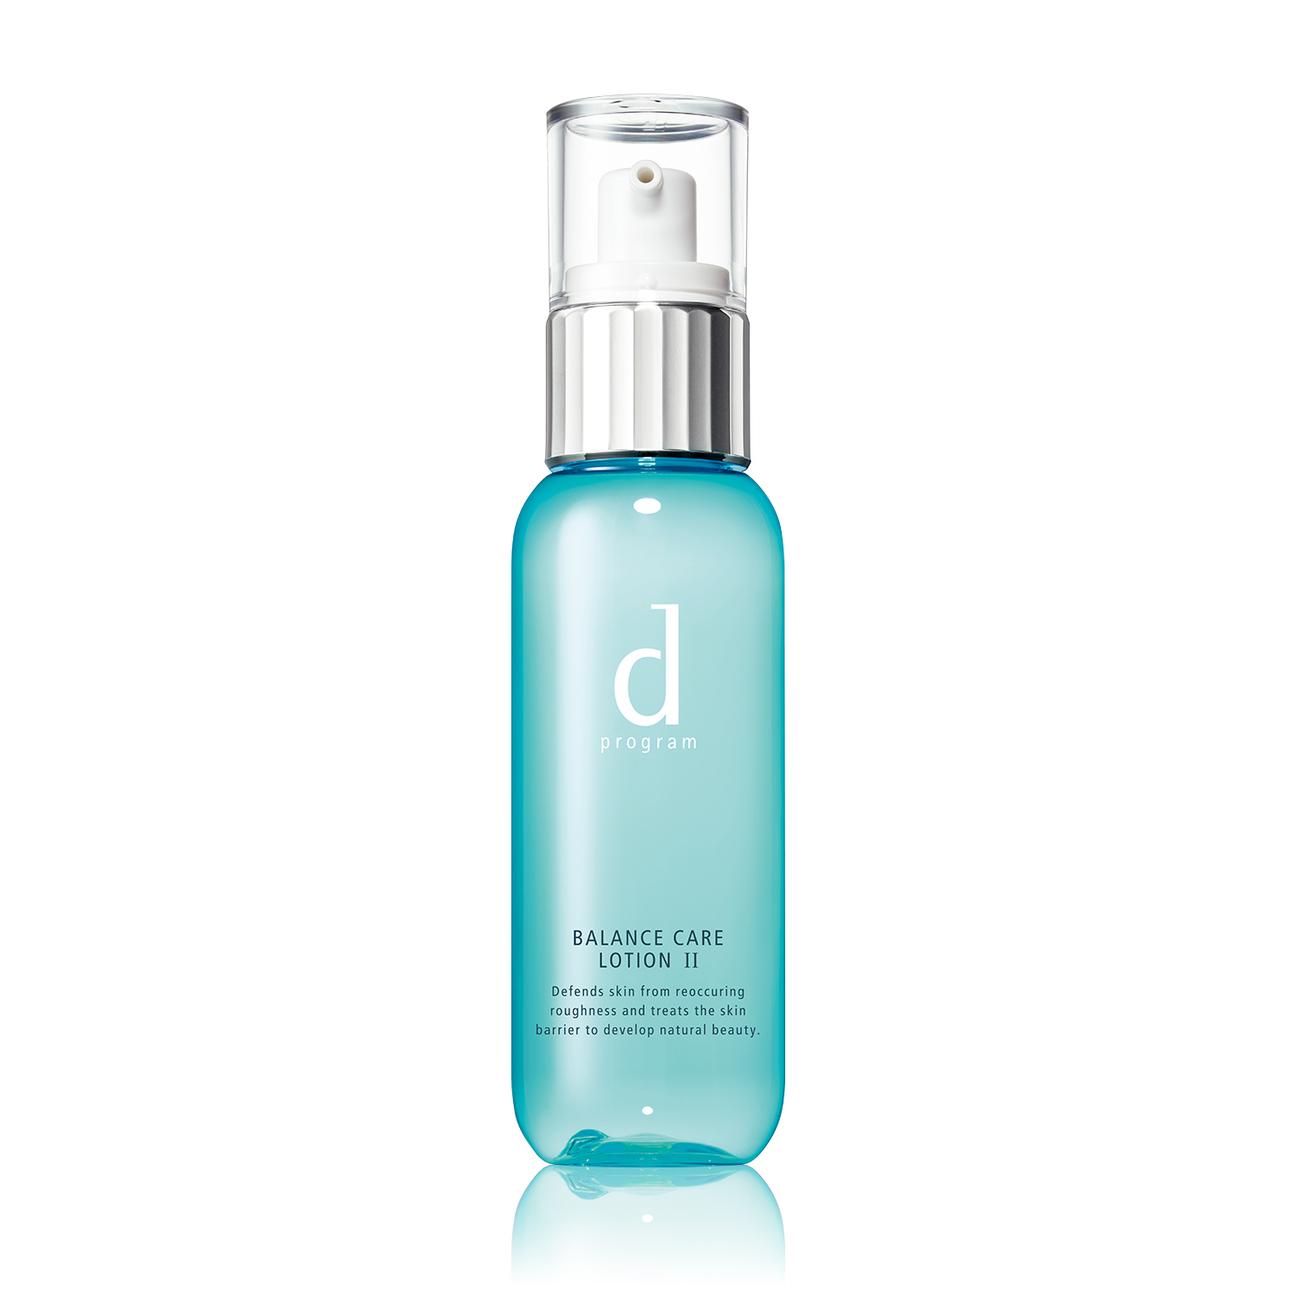 dプログラムの化粧水